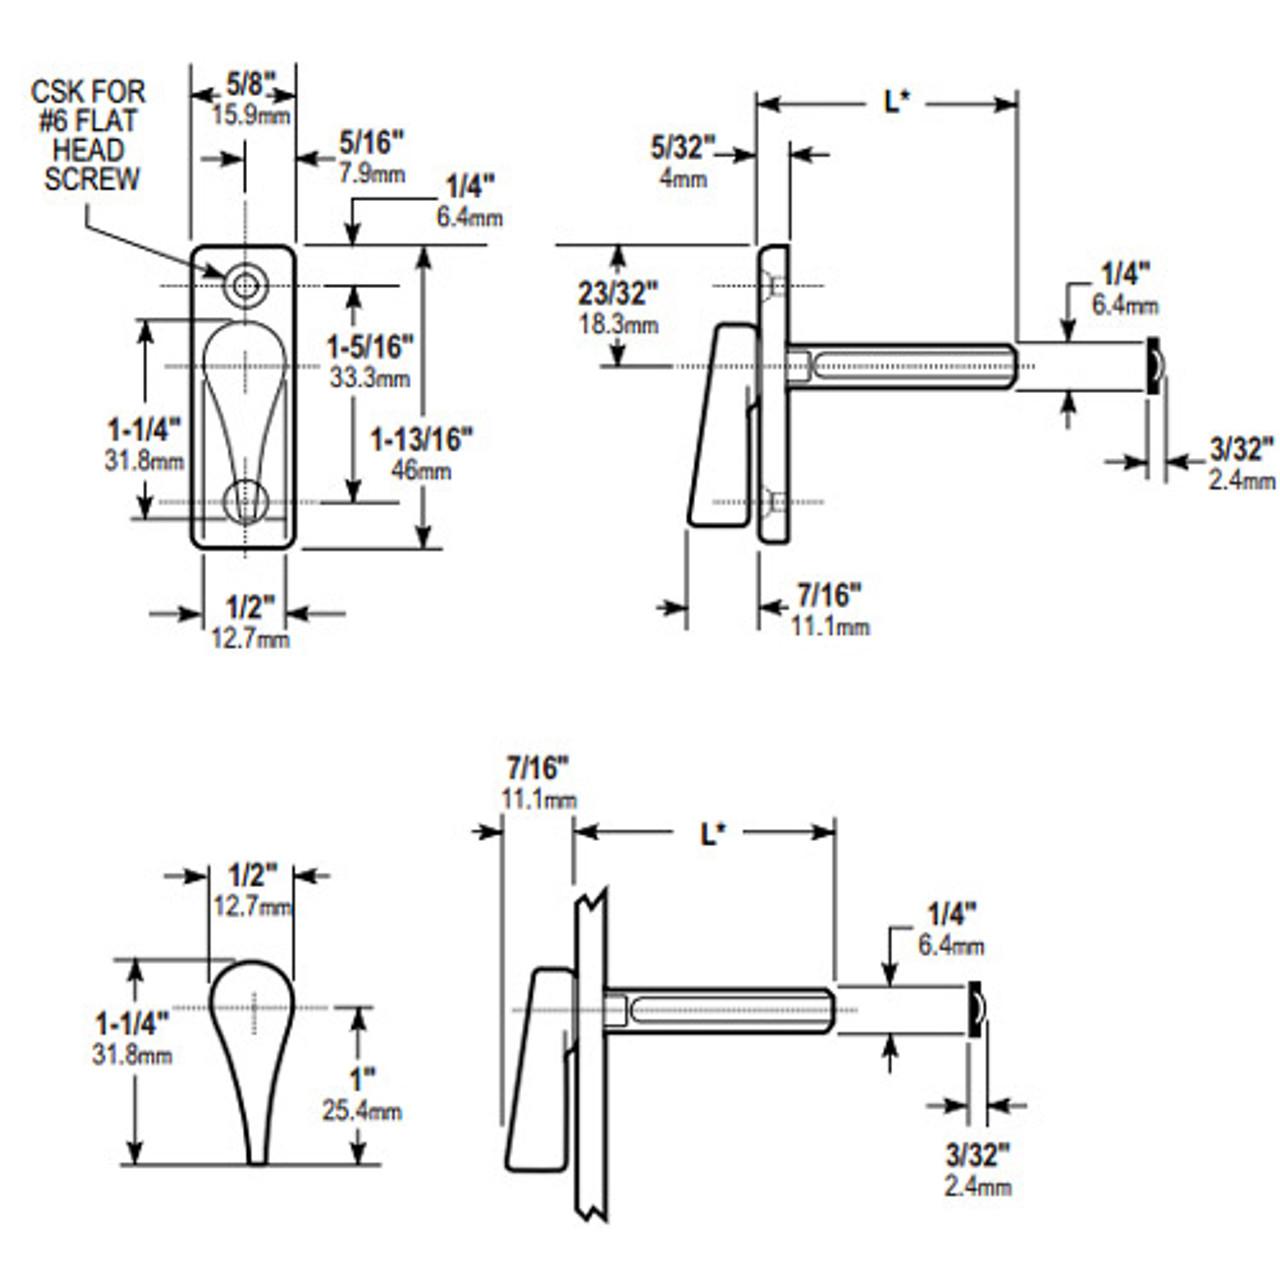 1000-21-15-130 Adams Rite 1000 Series Turns Dimensional View